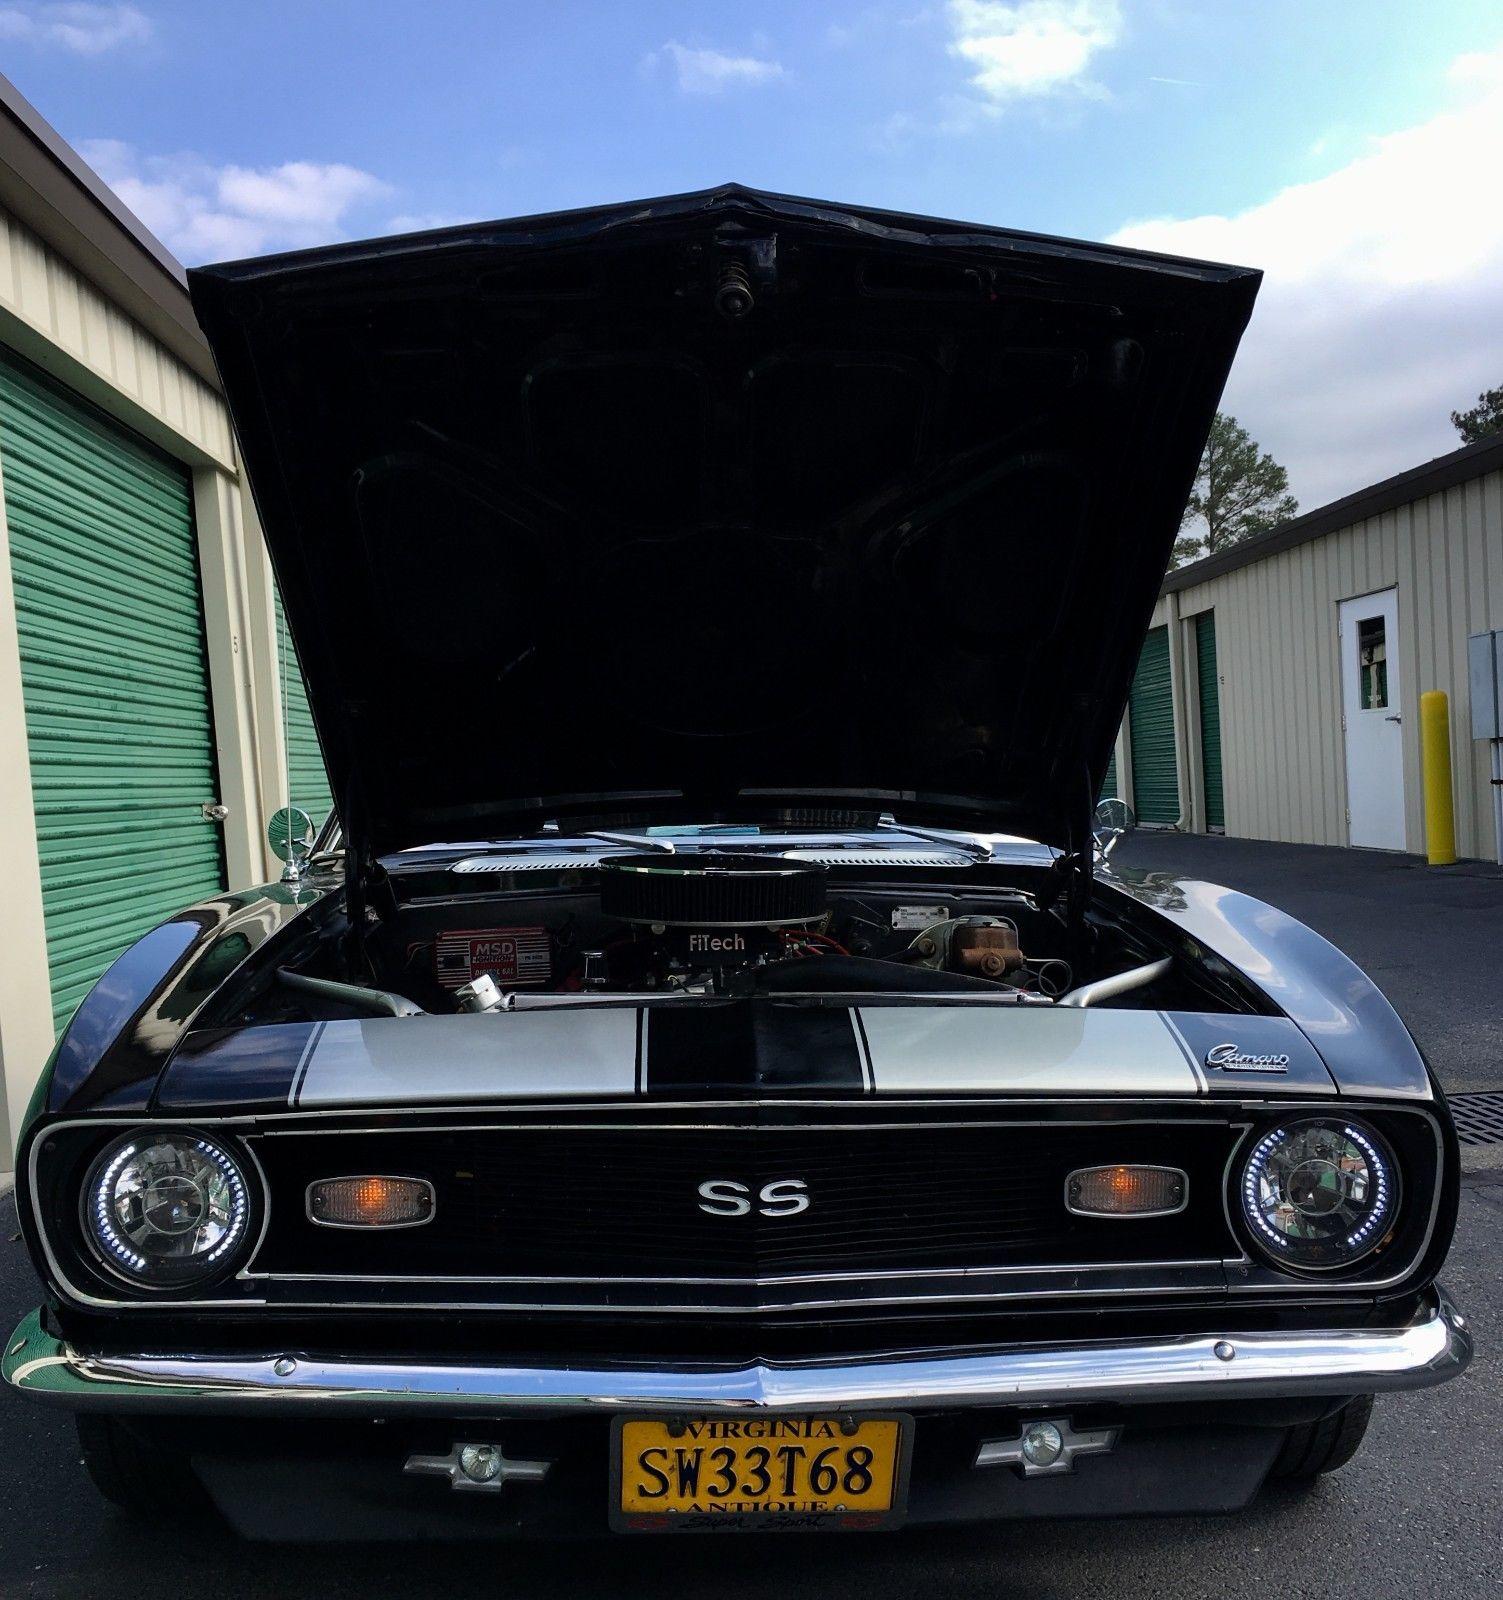 2016 Chevrolet Ss Camshaft: Great 1968 Chevrolet Camaro SS Style 1968 Camaro SS BIG